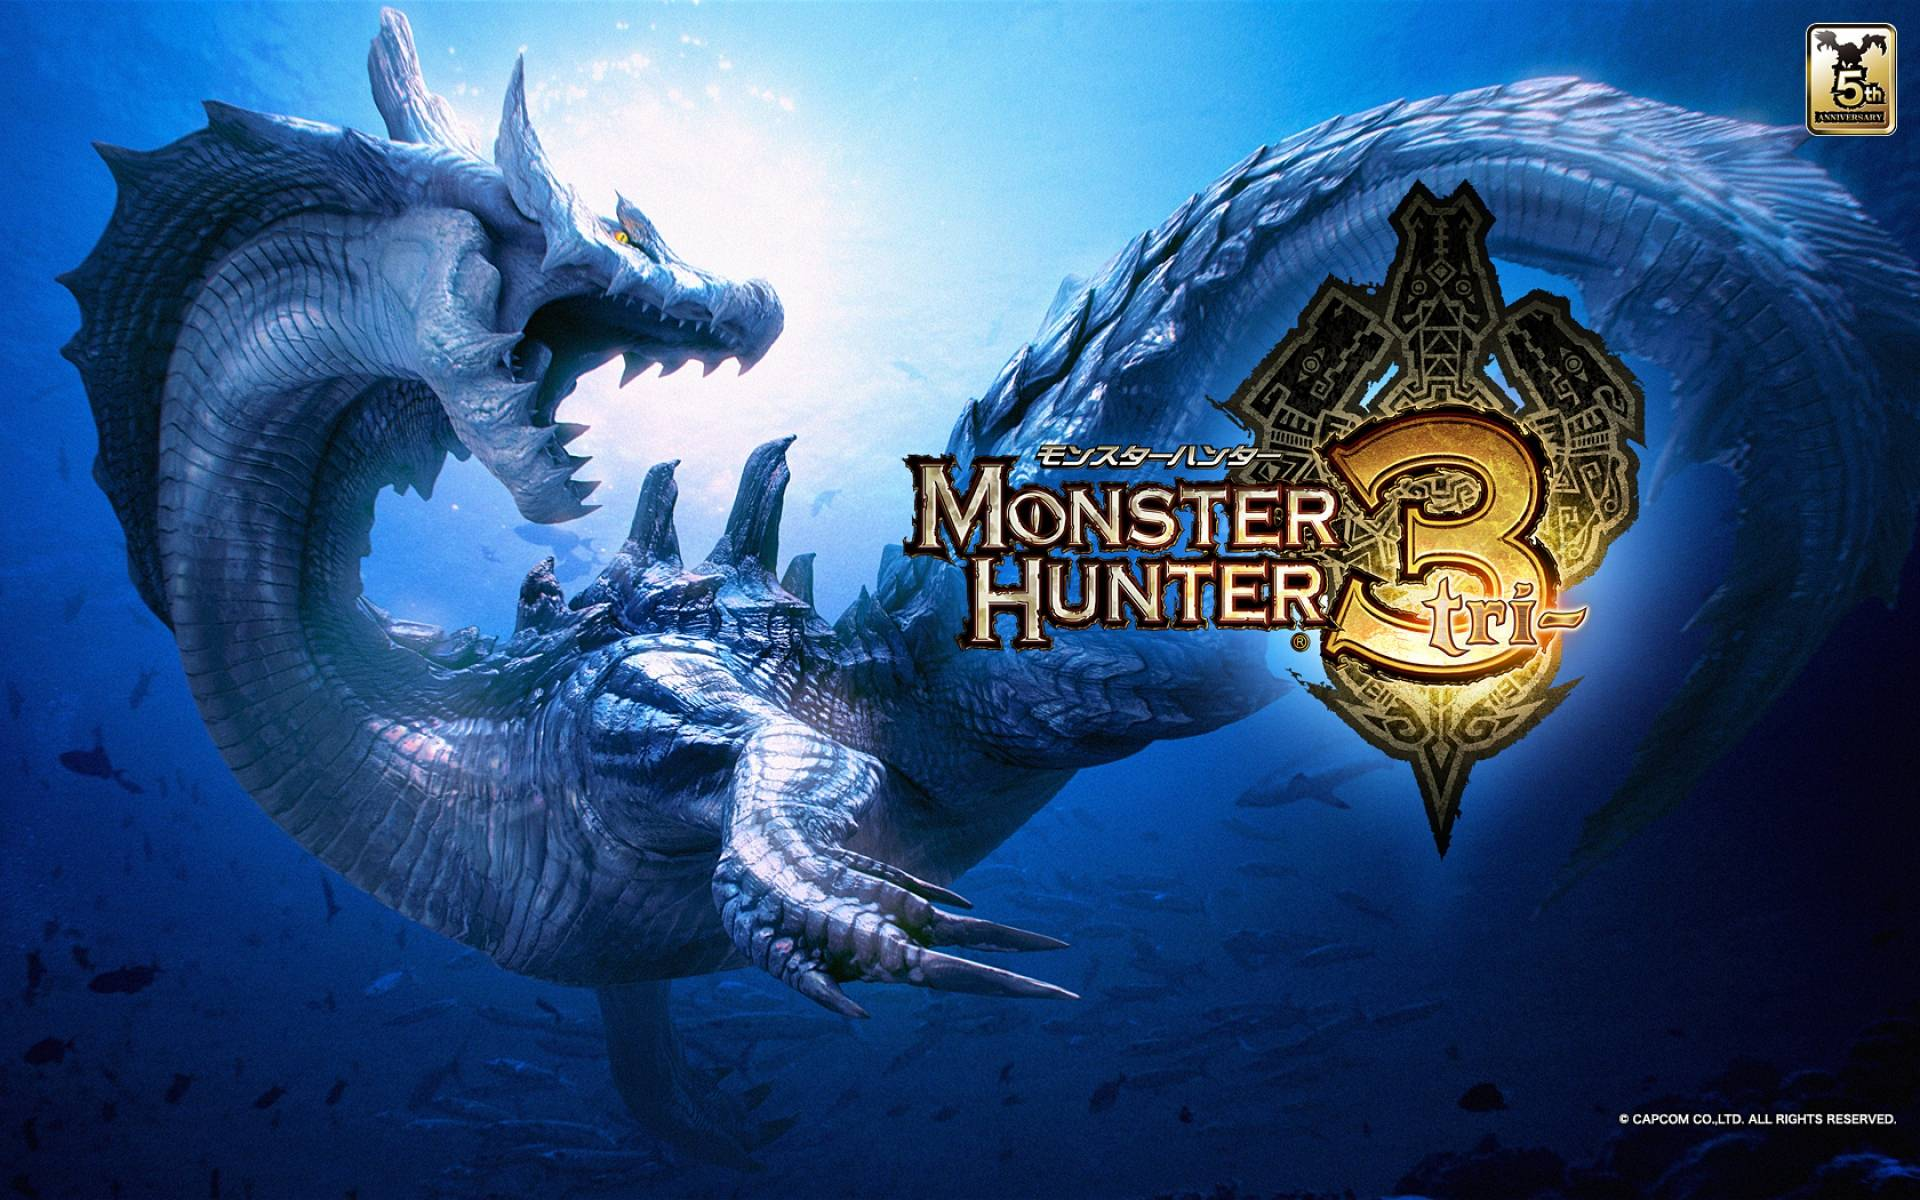 Monster Hunter Wallpapers - Wallpaper Cave